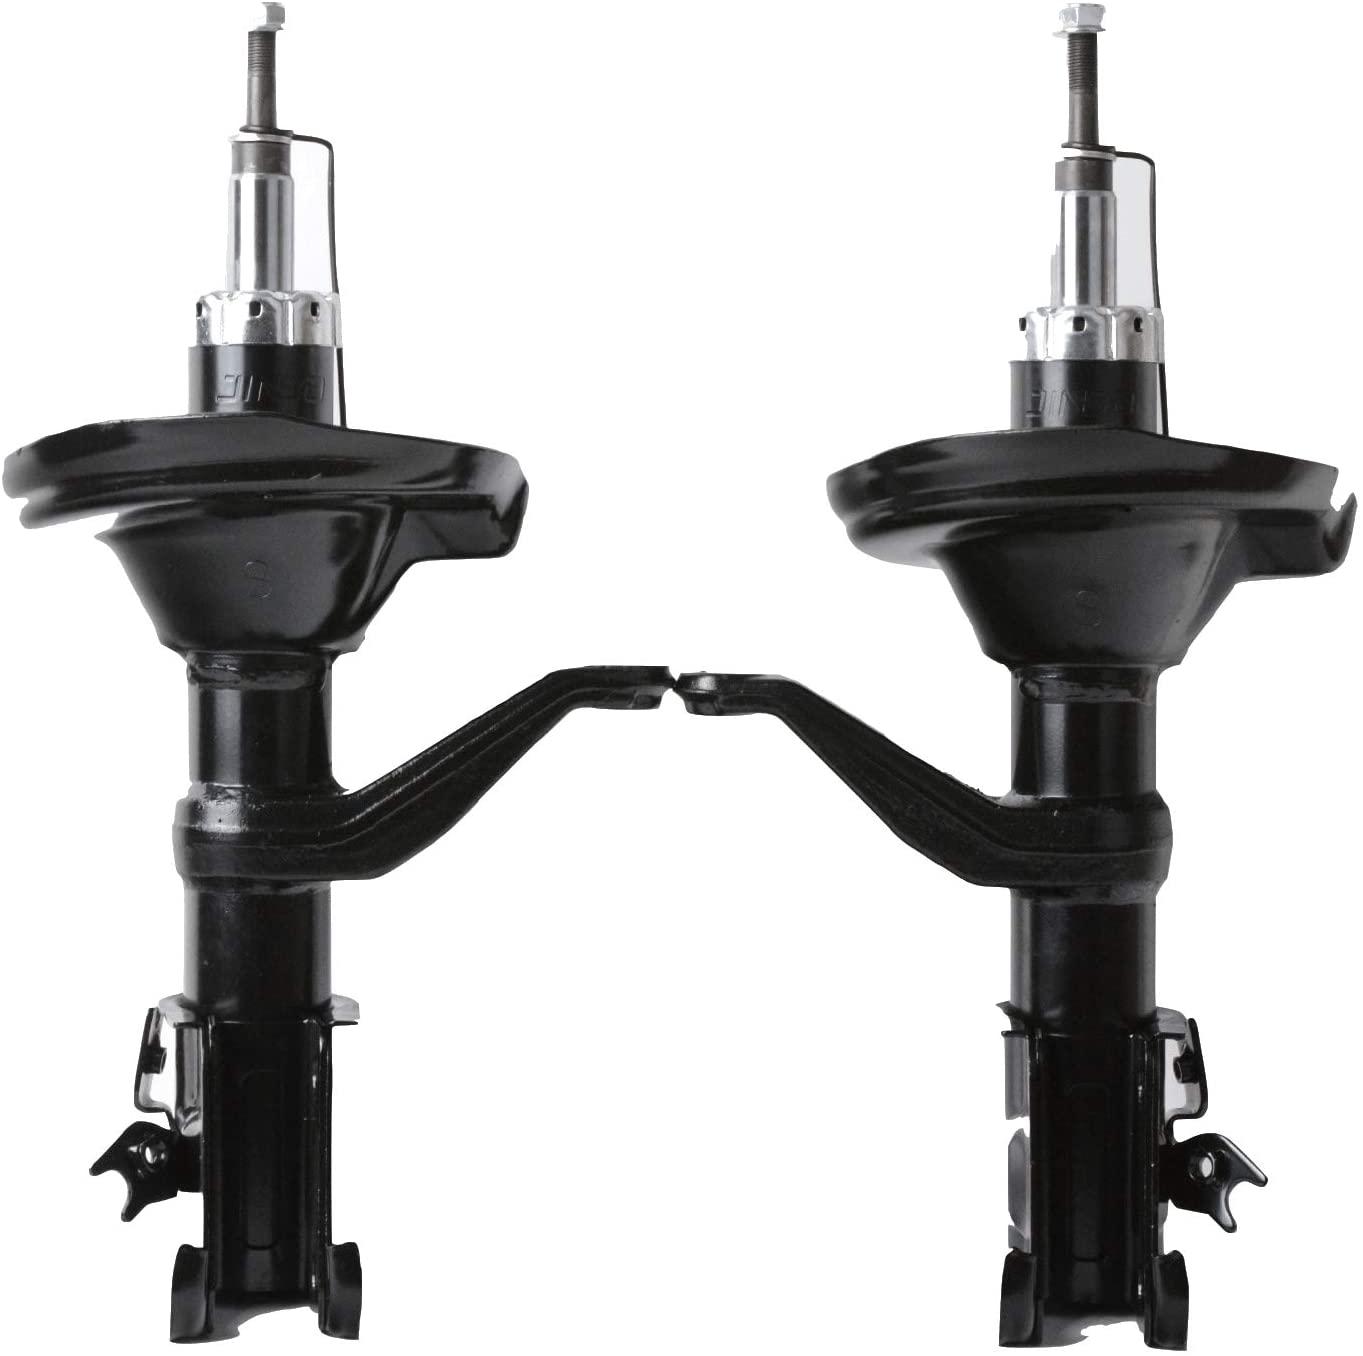 Laprive Auto 1 pair Front Gas Shock Absorber Strut Kit For 03-06 Honda Element